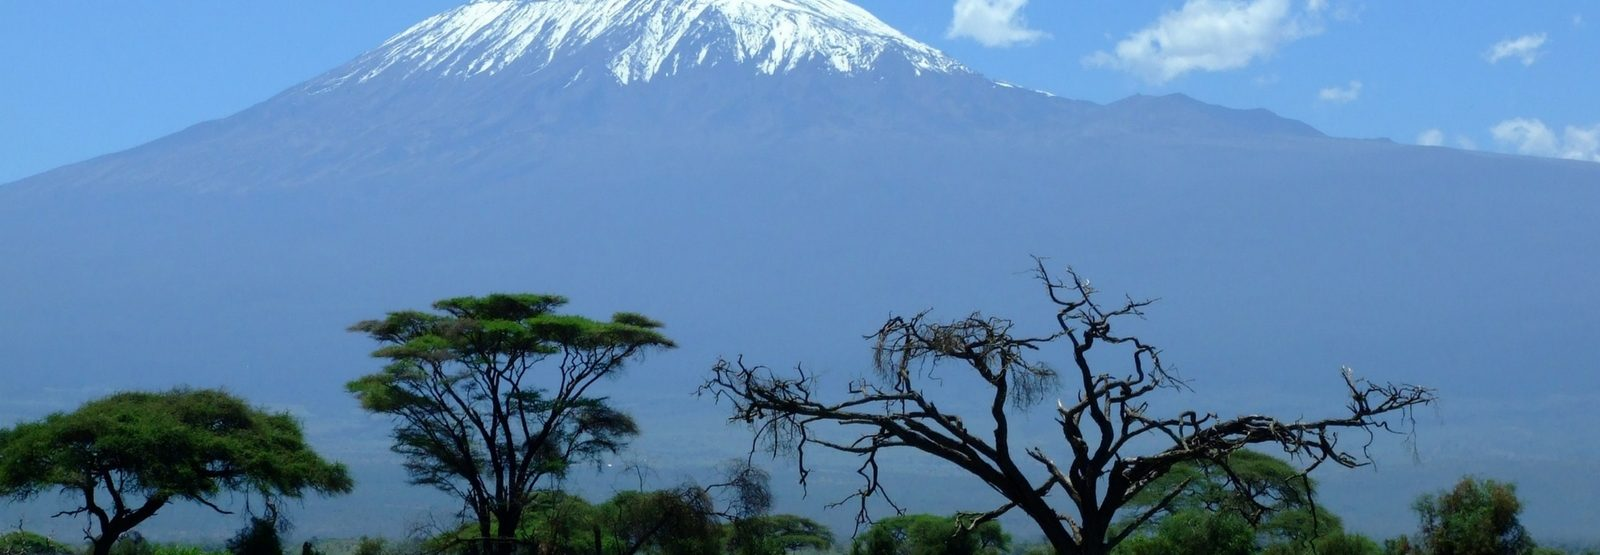 Small Group Adventure to Kilimanjaro Canva